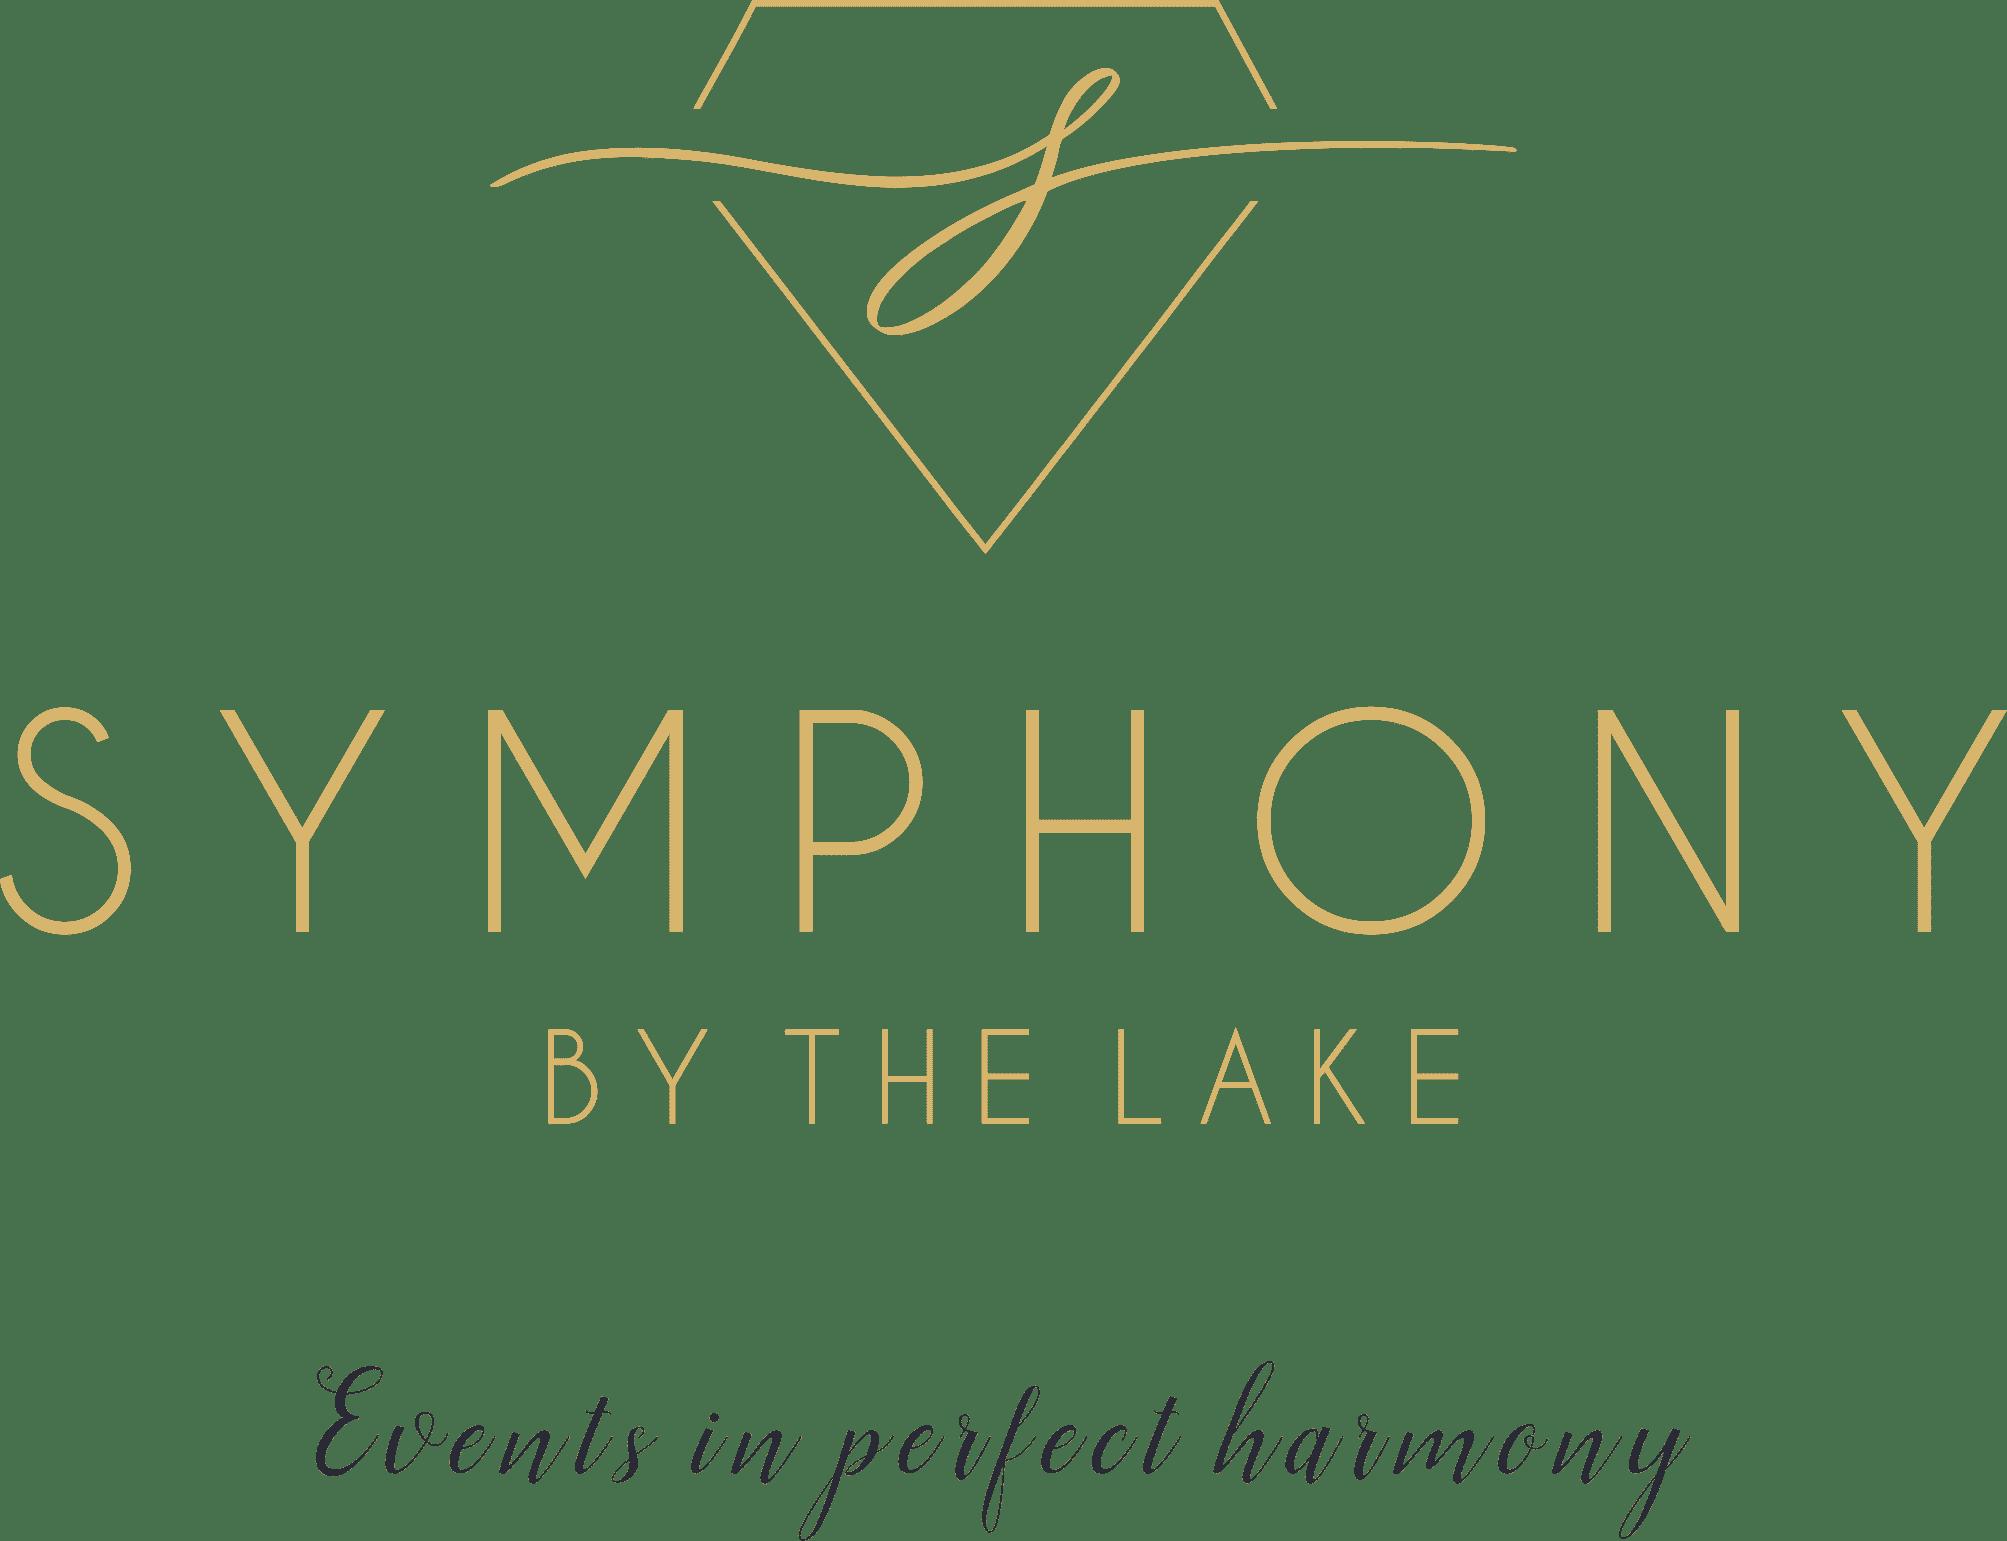 Symphony by the Lake